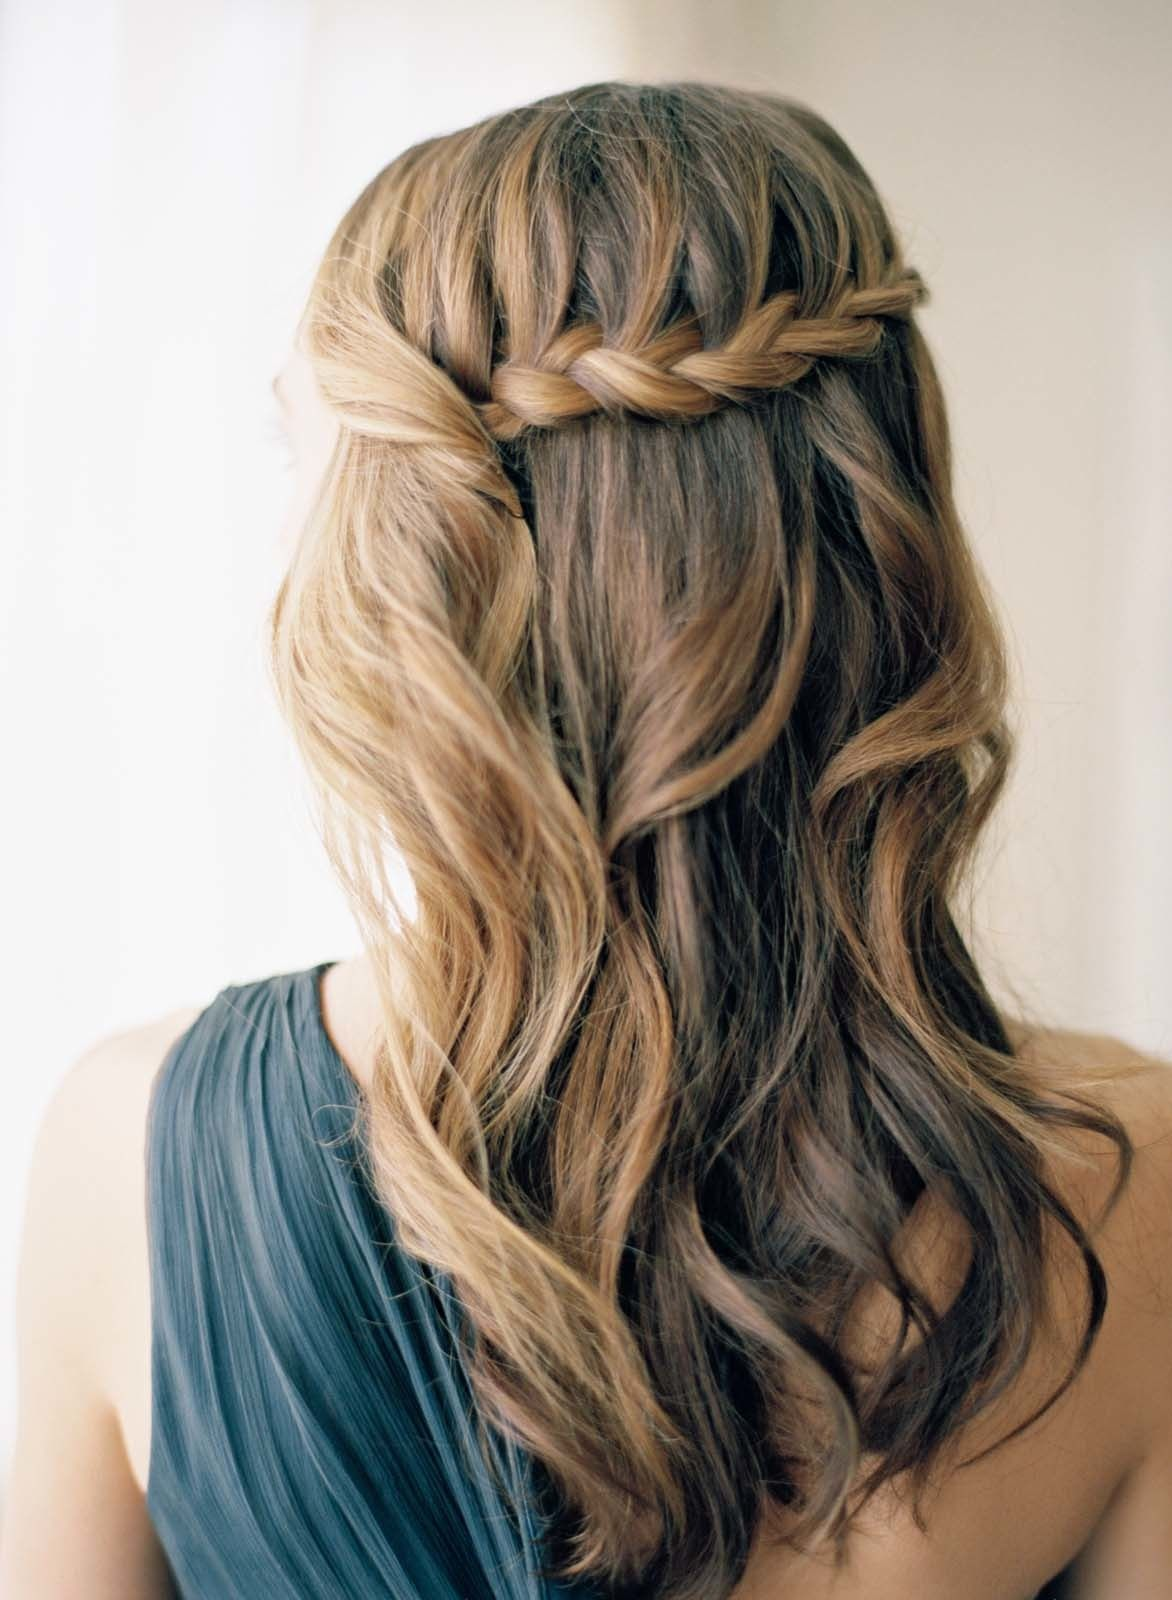 Bridesmaidsu tea at trump winery braided wedding hair teas and